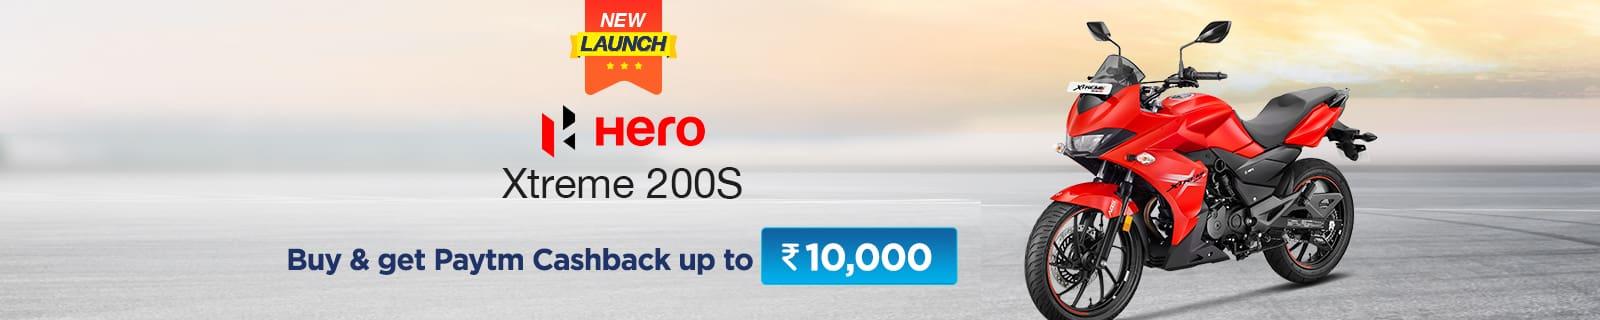 New Launch !! Hero Xtreme 200S